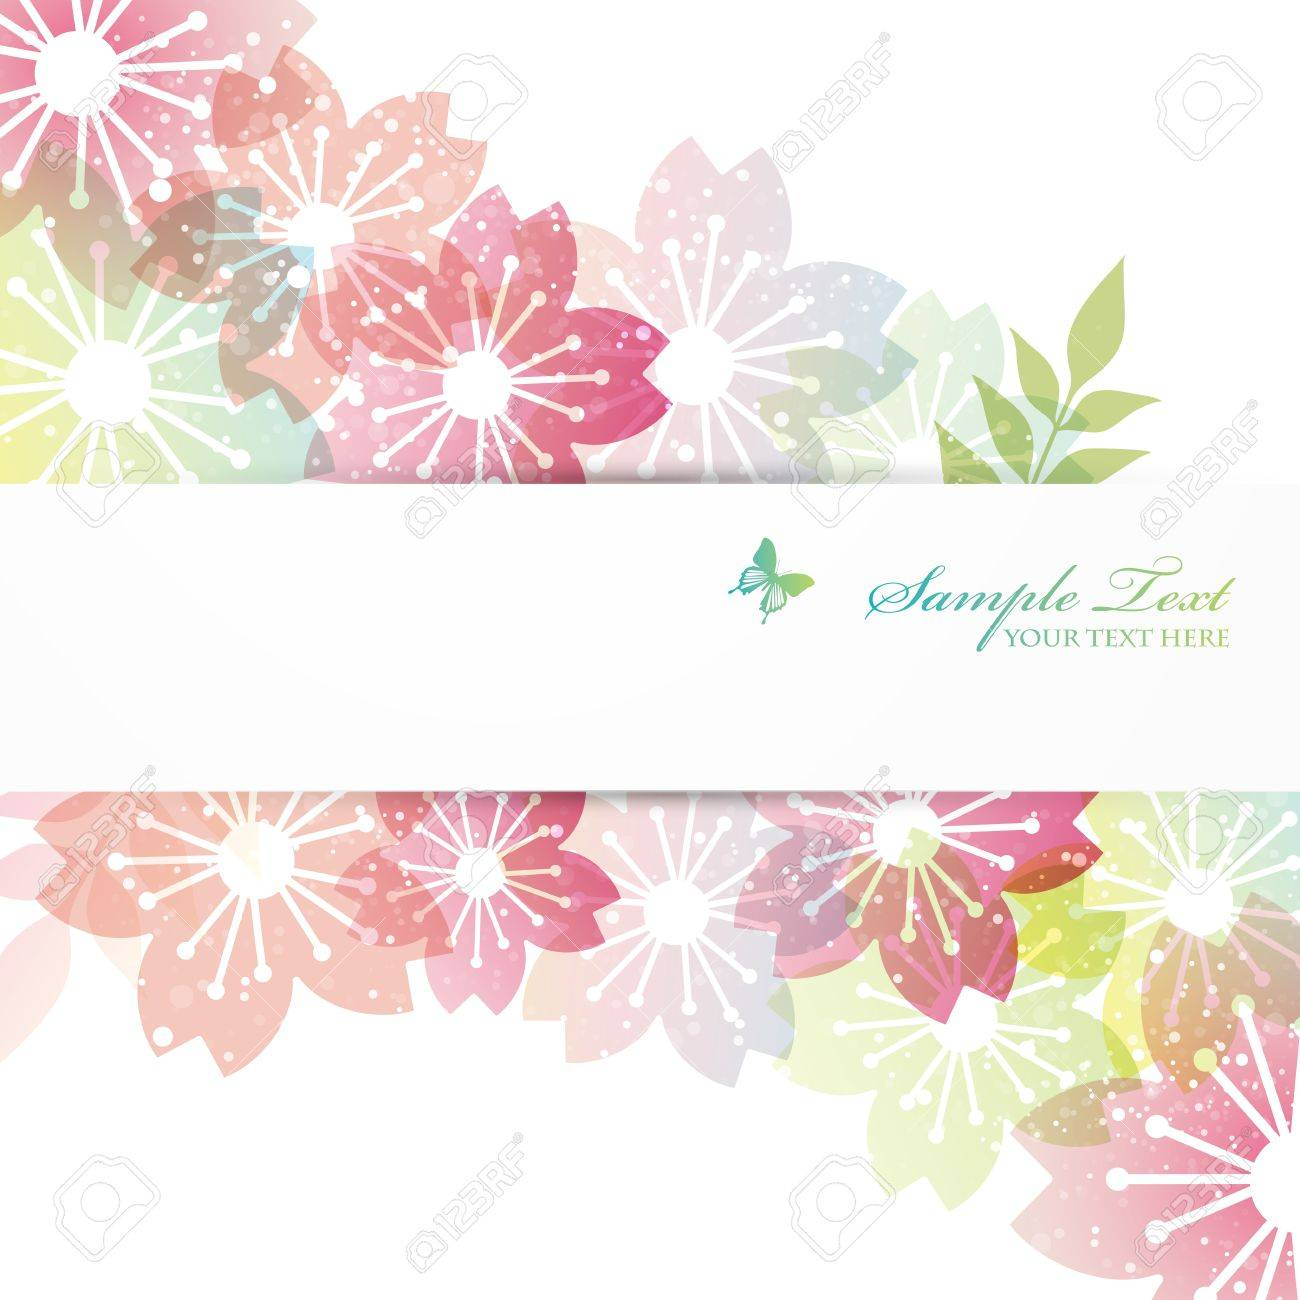 cherry blossom flowers background - 17476916